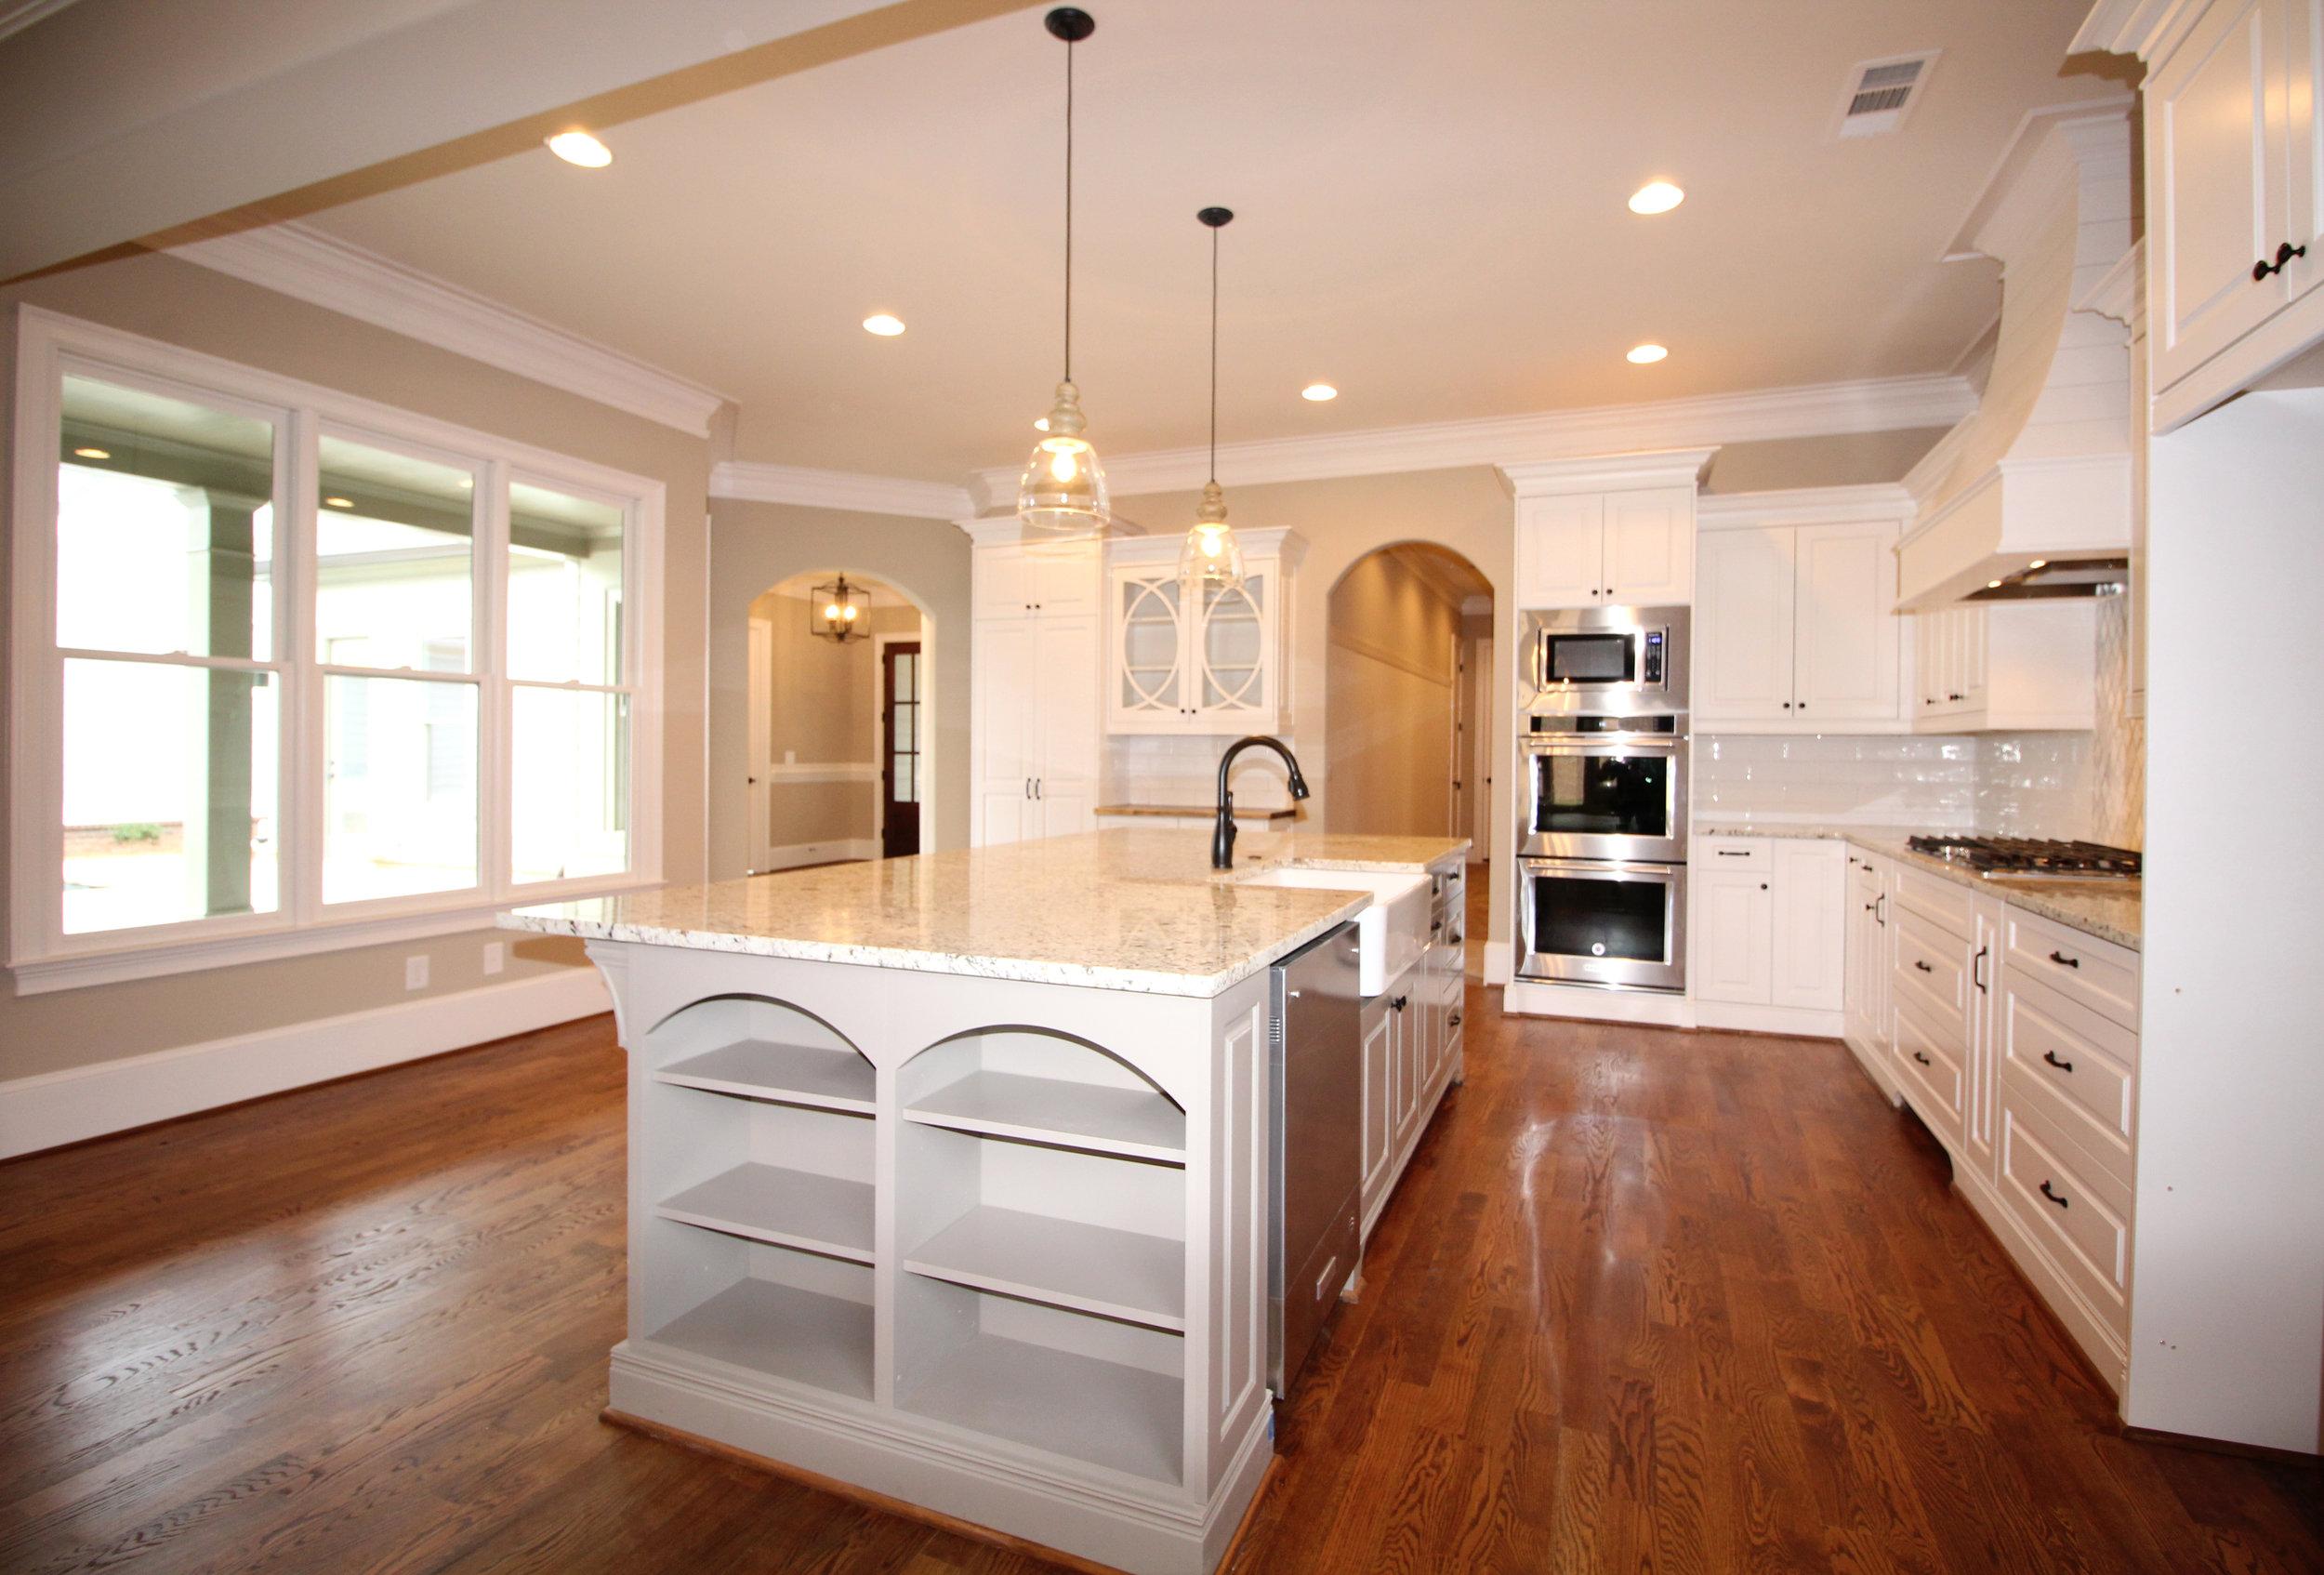 built-in-shelves-large-kitchen-island.JPG